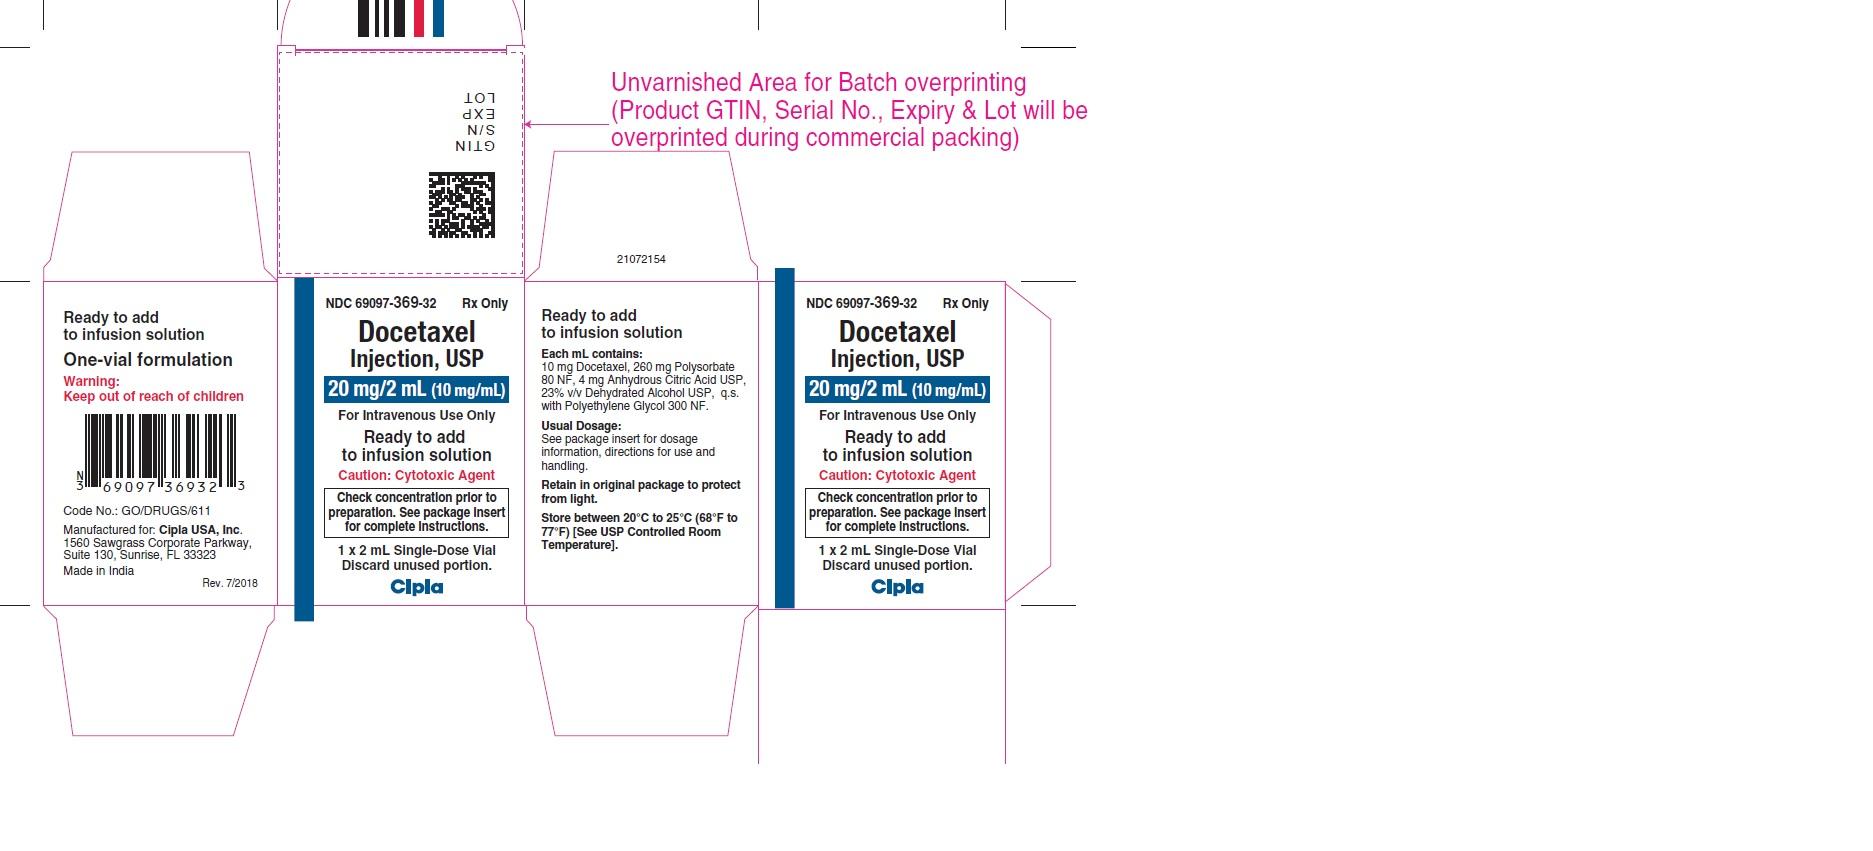 Cipla carton label-20mg-2mL